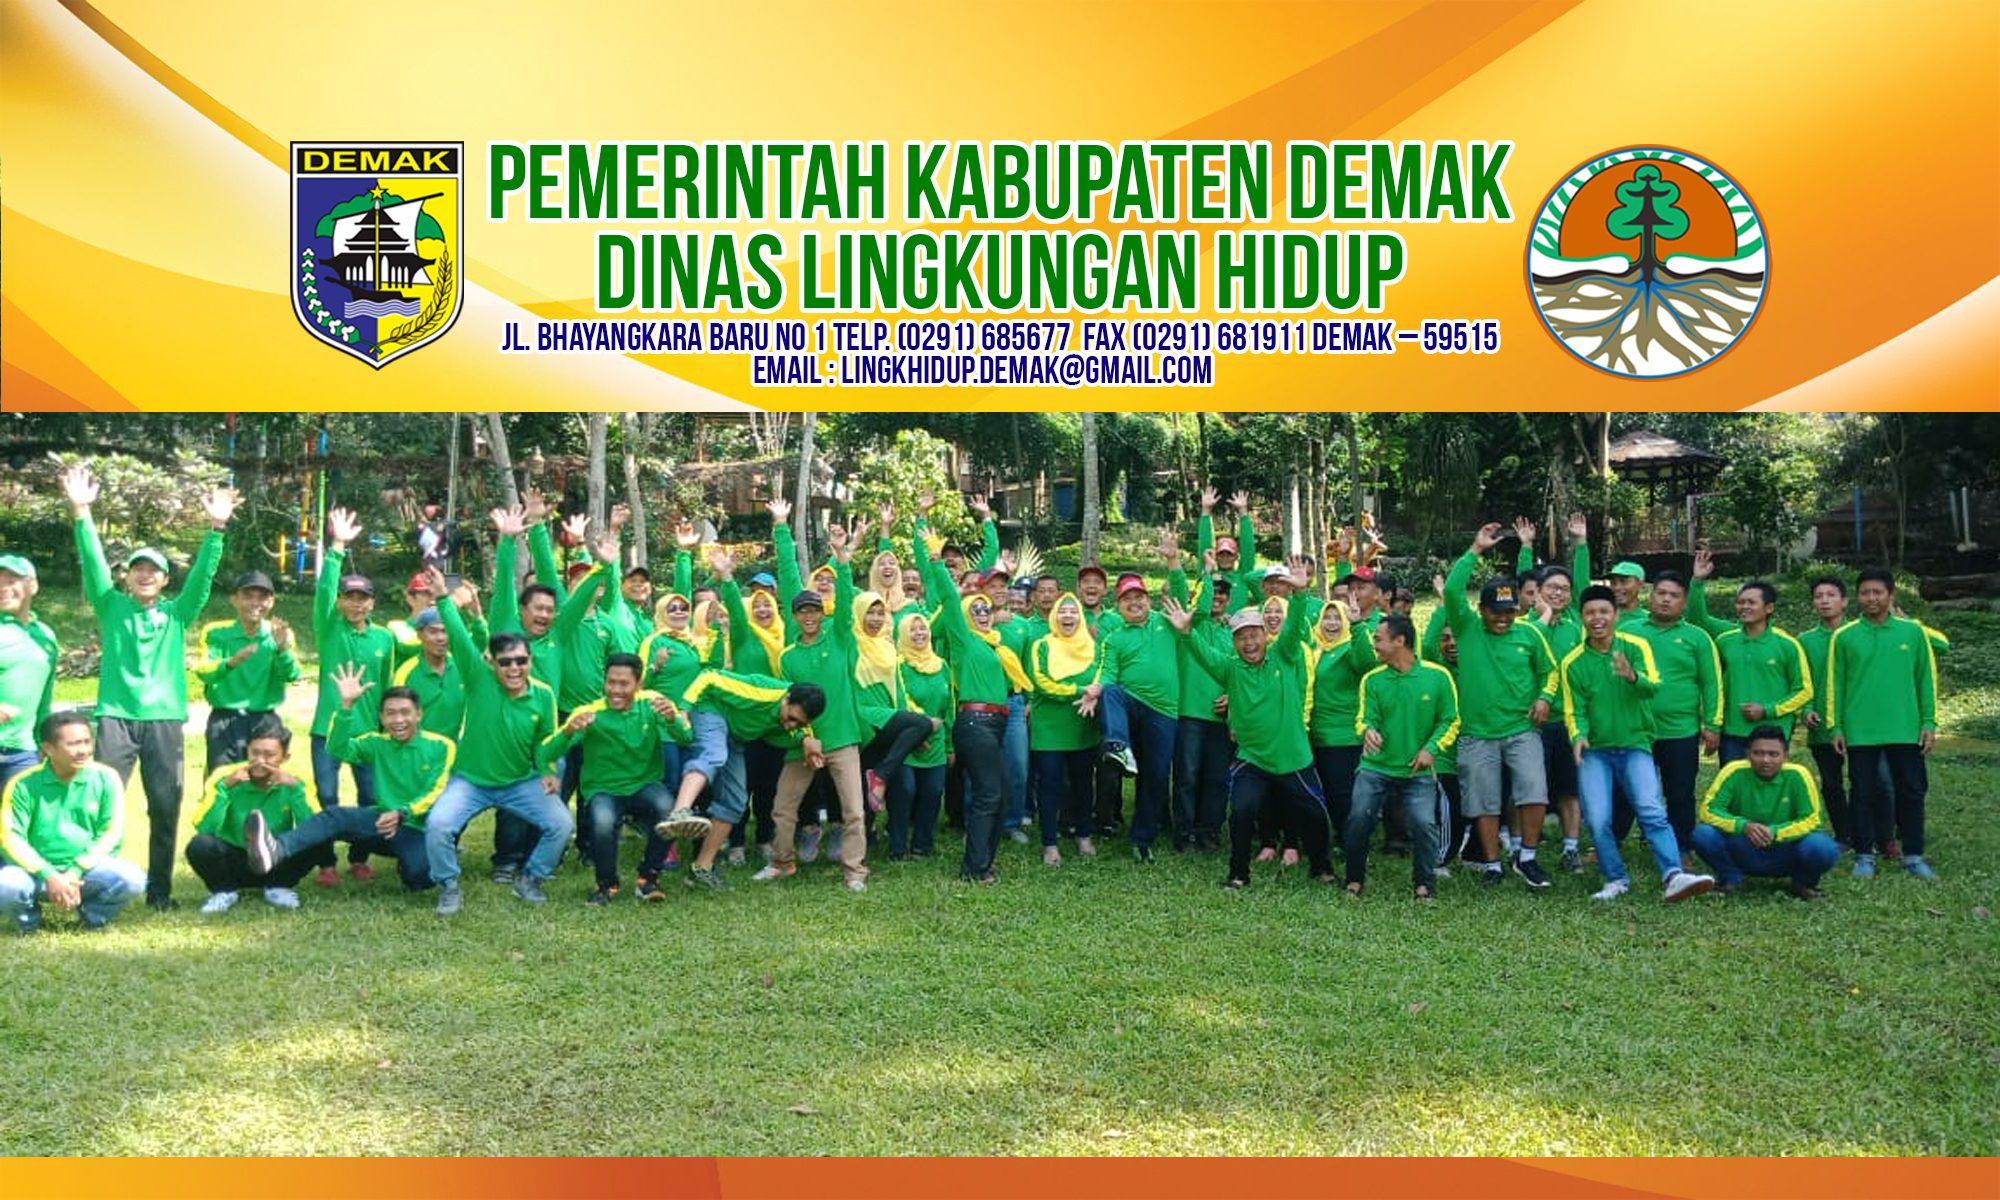 Selamat Datang di Website Resmi Dinas Lingkungan Hidup Kabupaten Demak